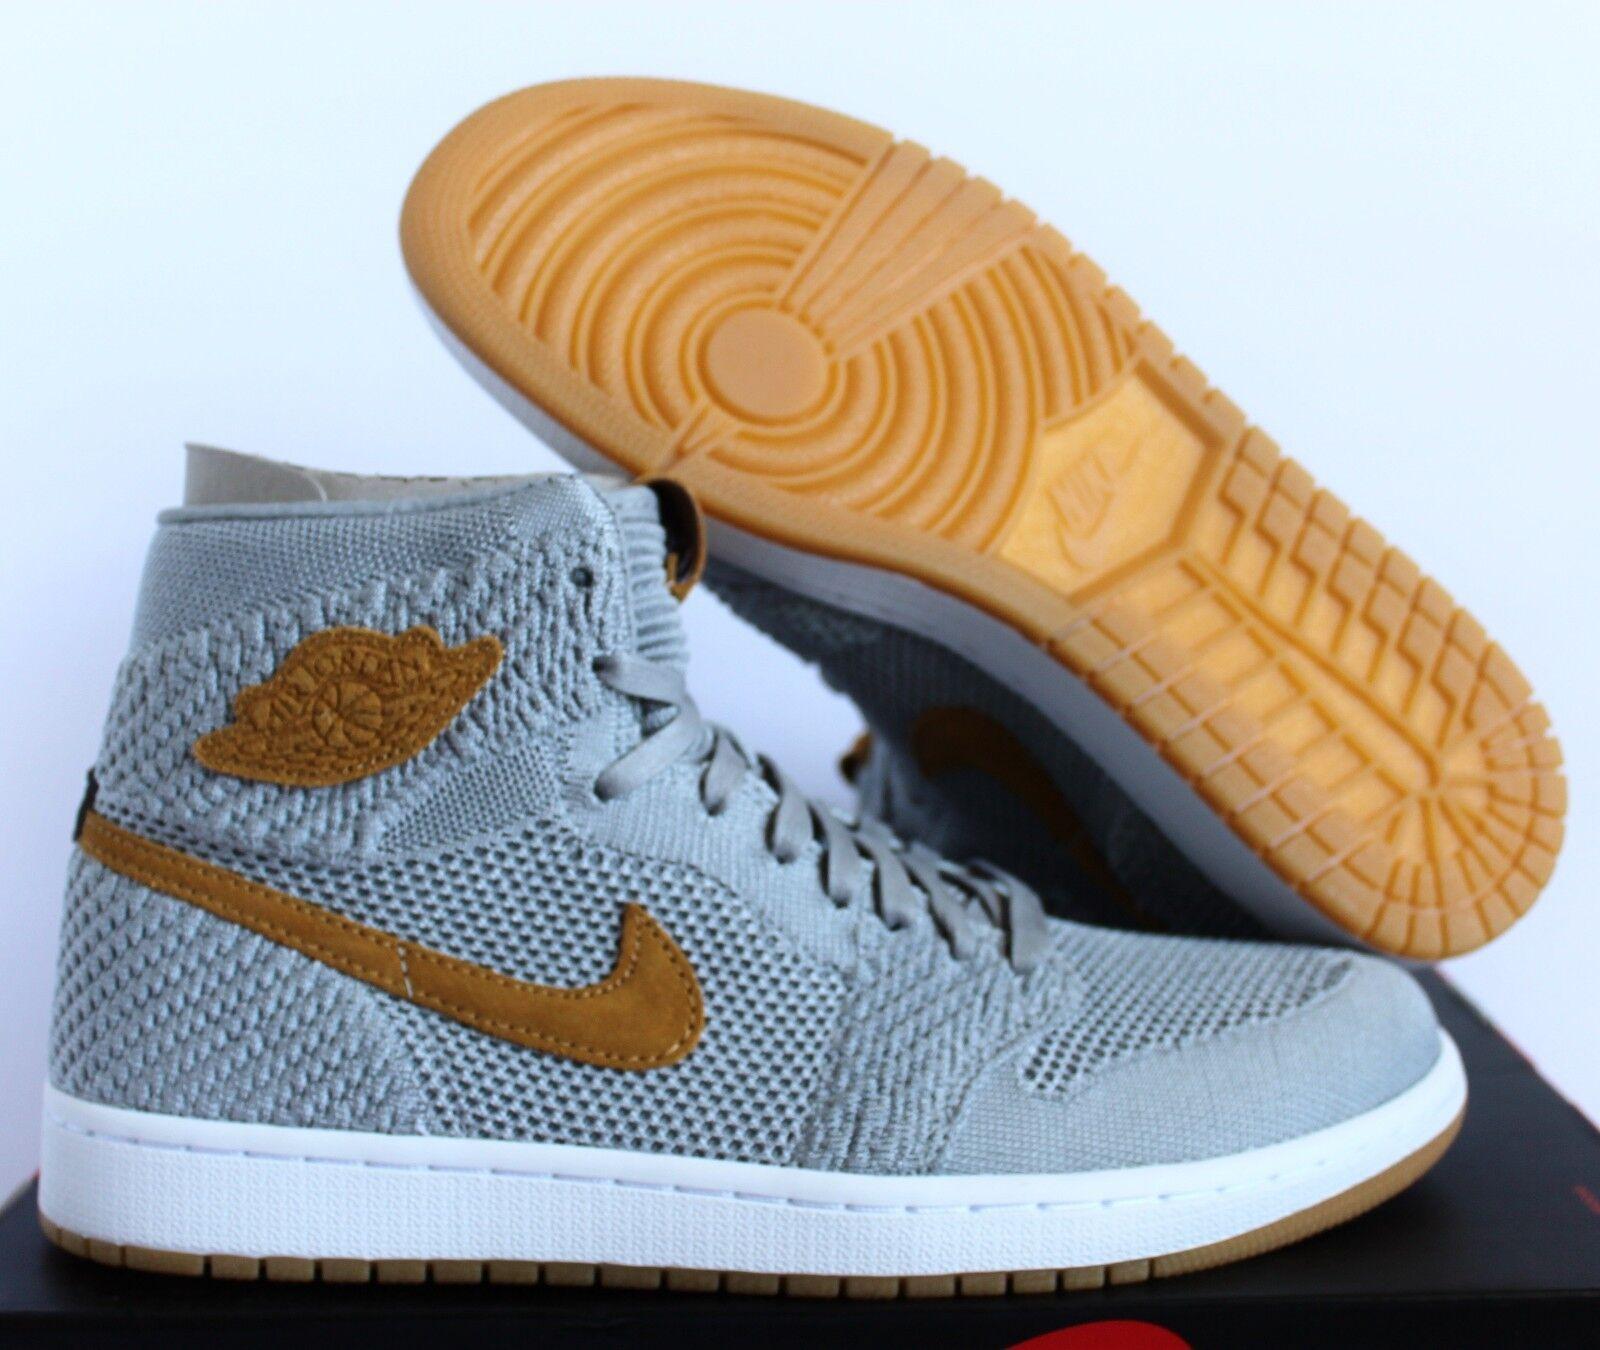 Nike air jordan 1 'ciao flyknit lupo grey-golden raccolto sz 10 [919704-025]